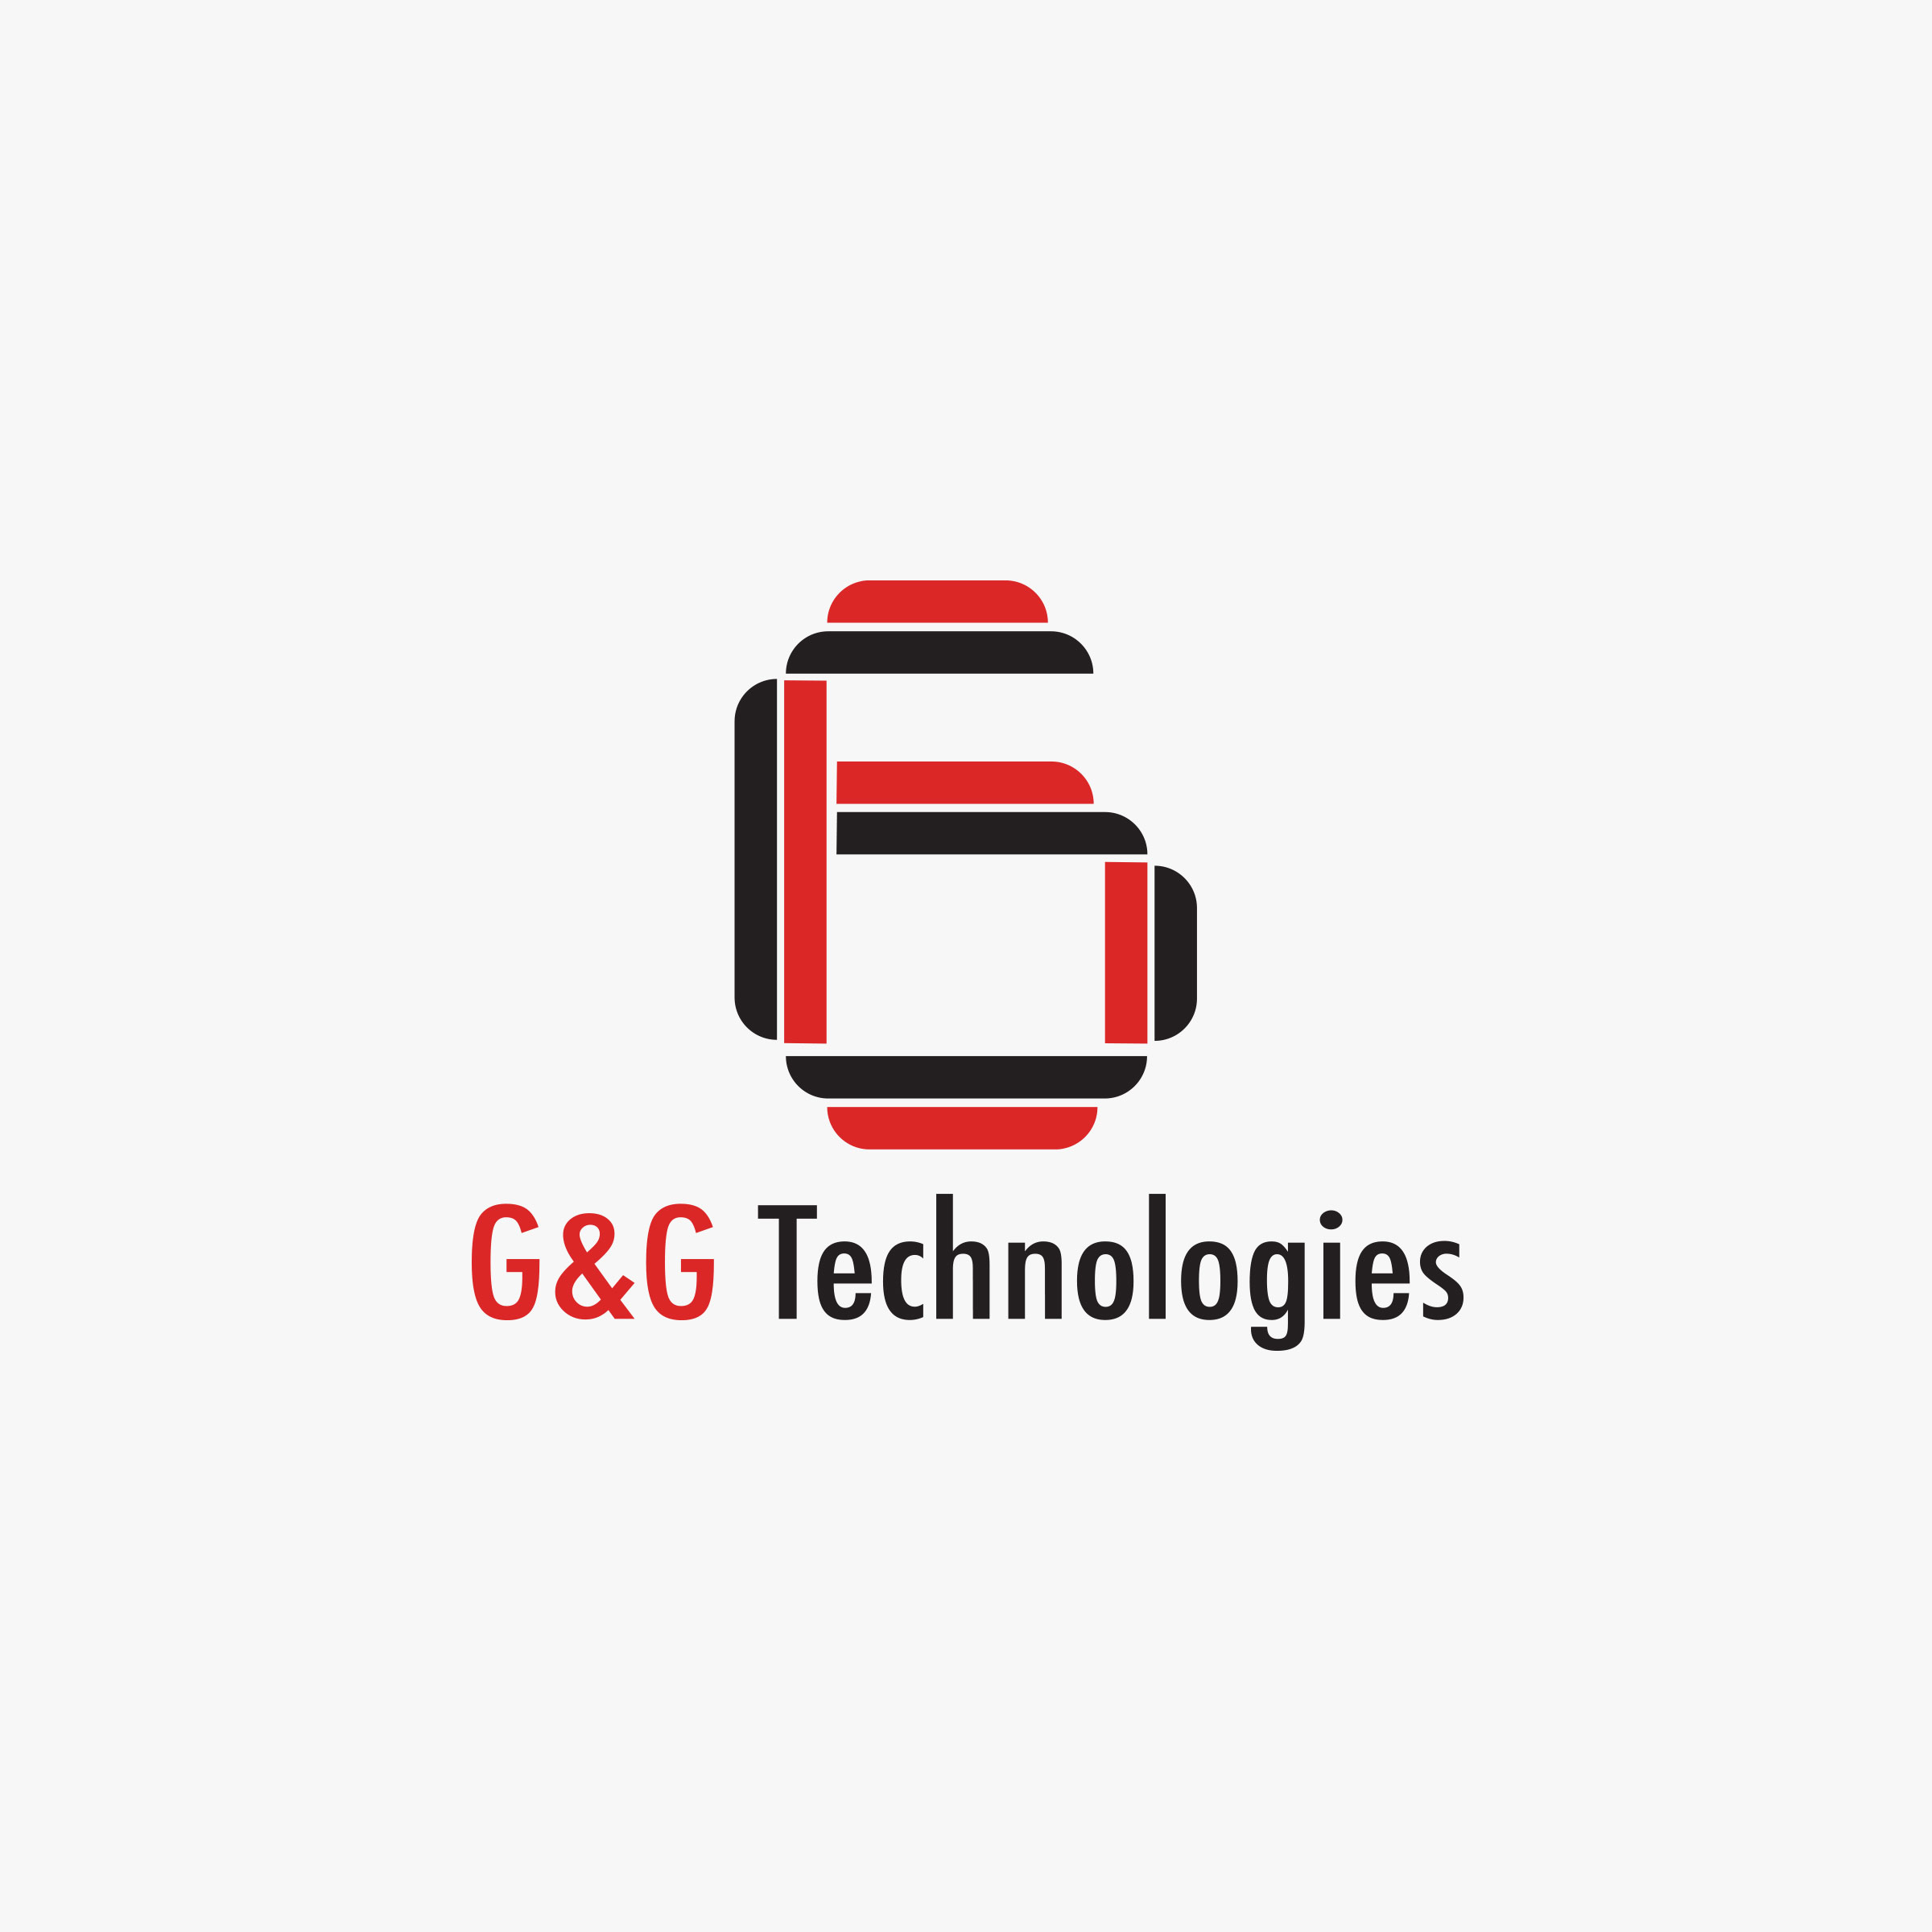 gg-tech-logo-design-by-create.jpg